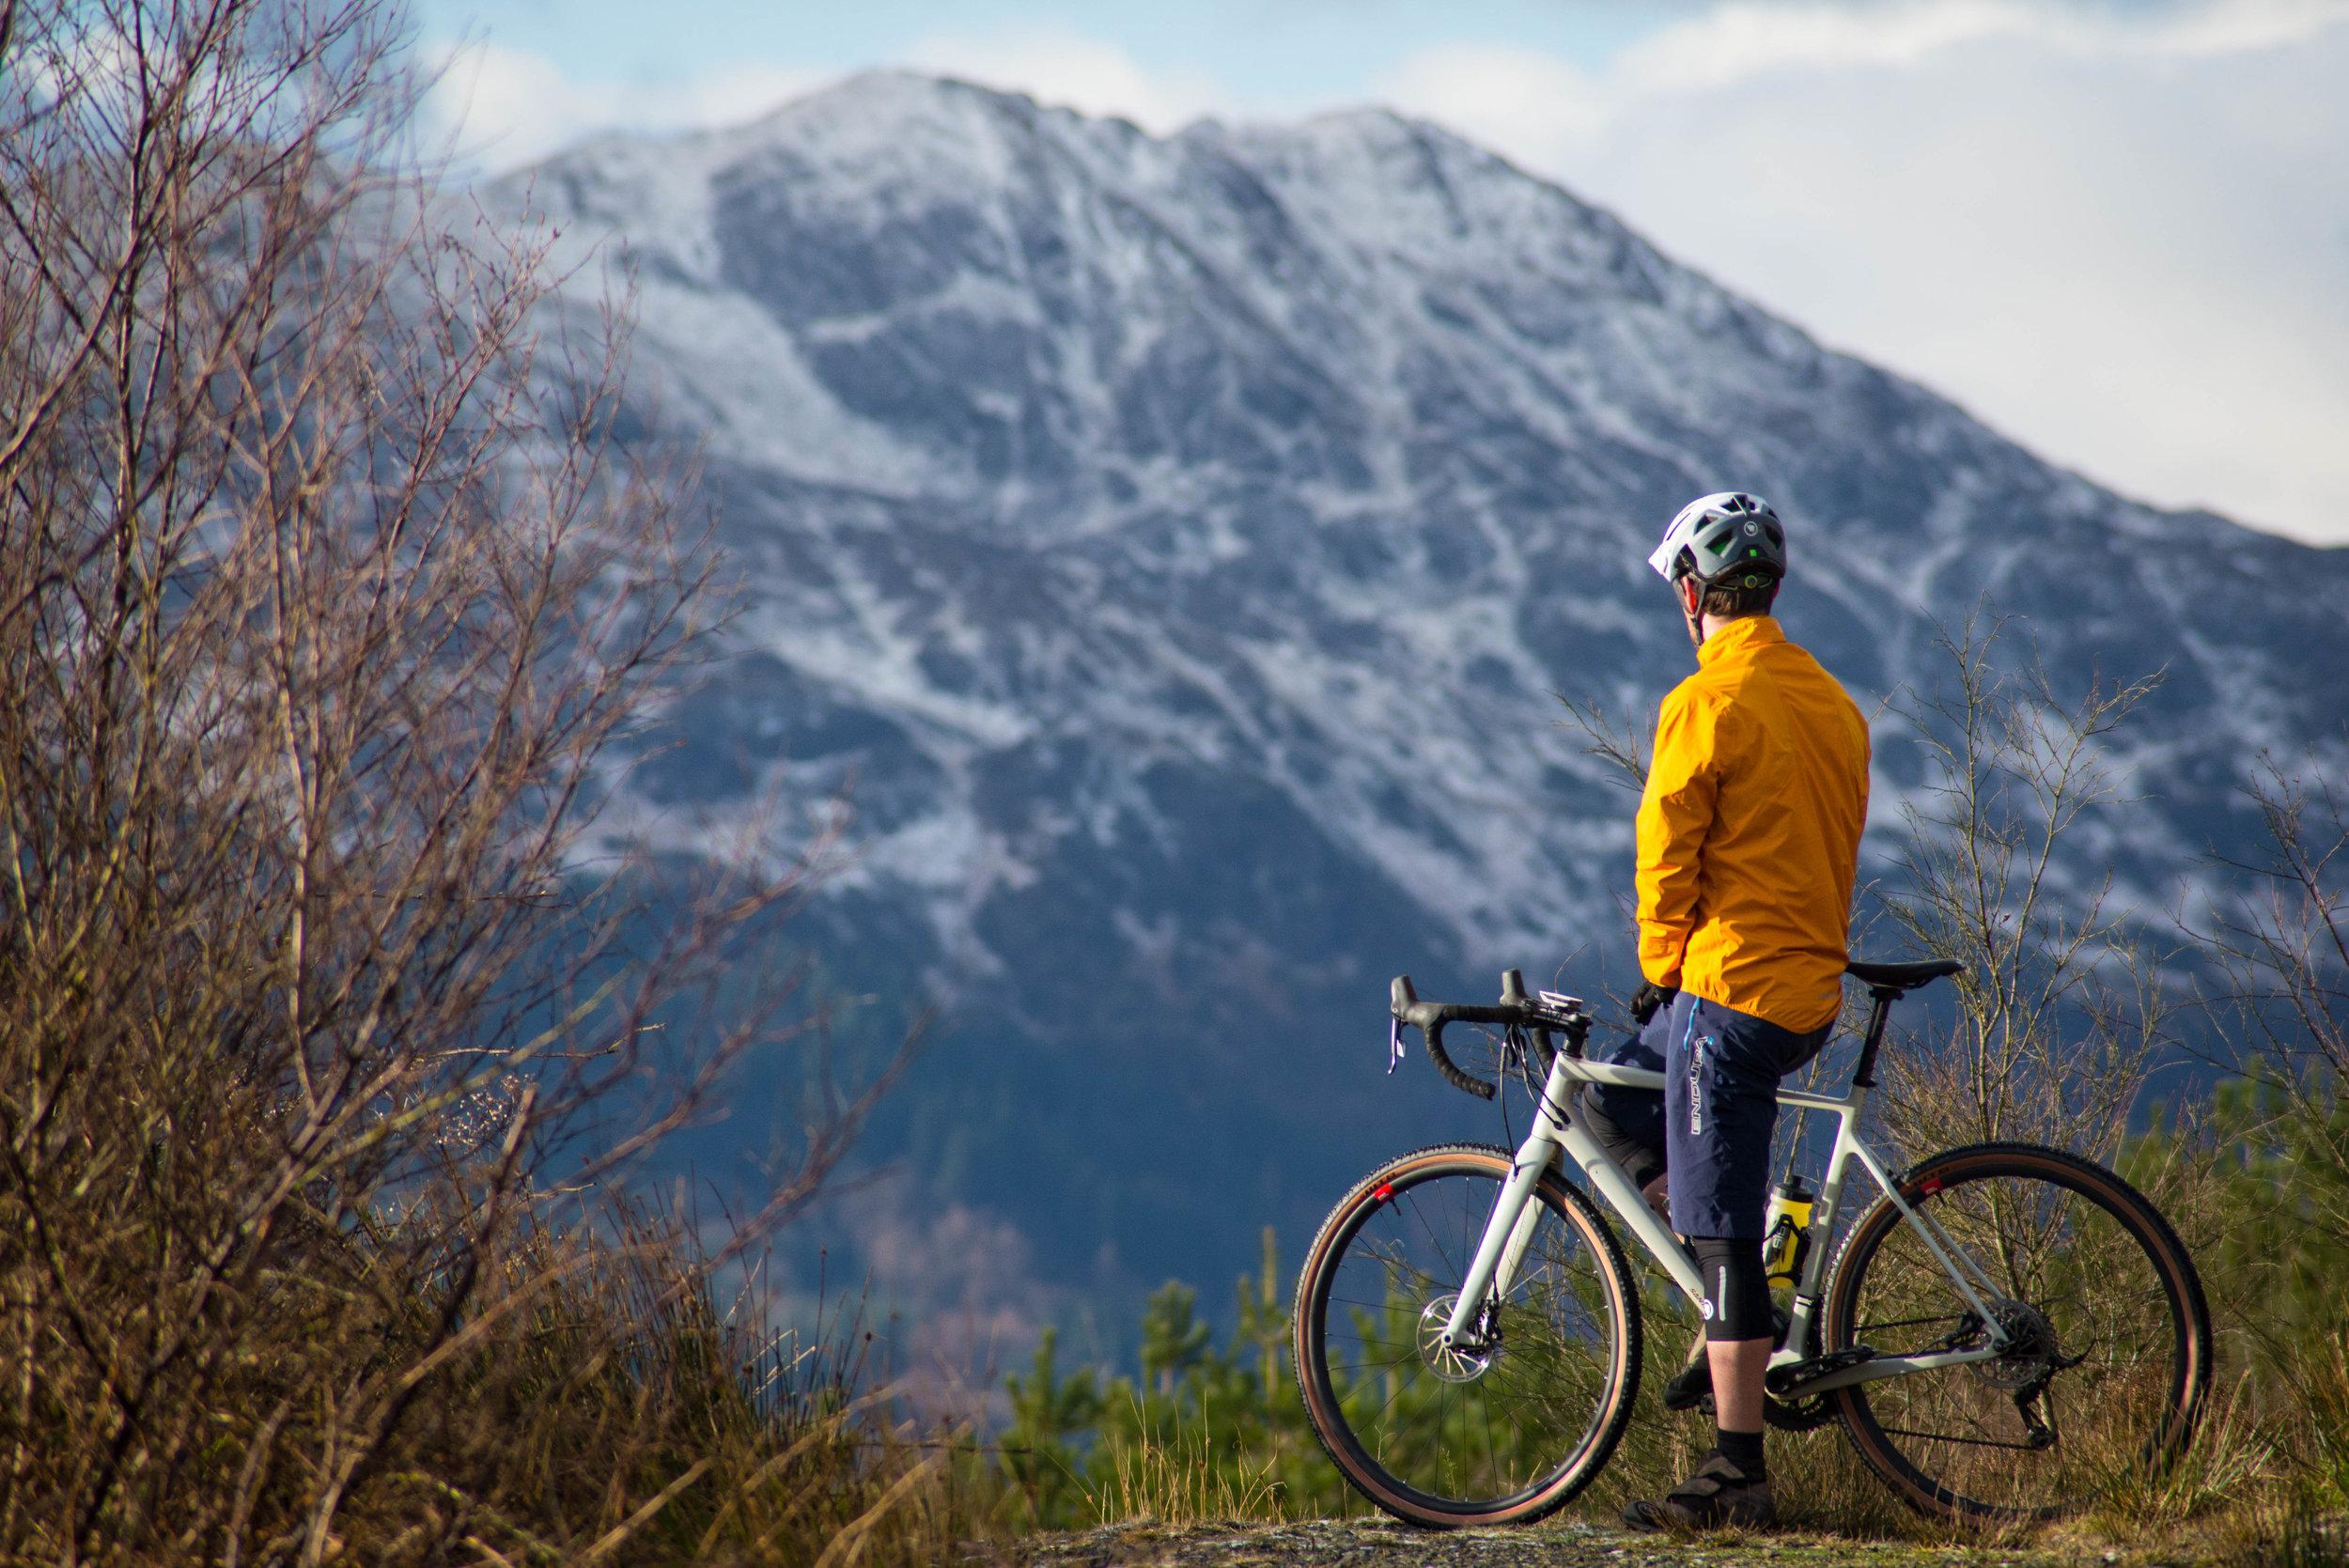 Endura kit, a Santa Cruz bike and some Dukes Weekender landscape… perfect :)